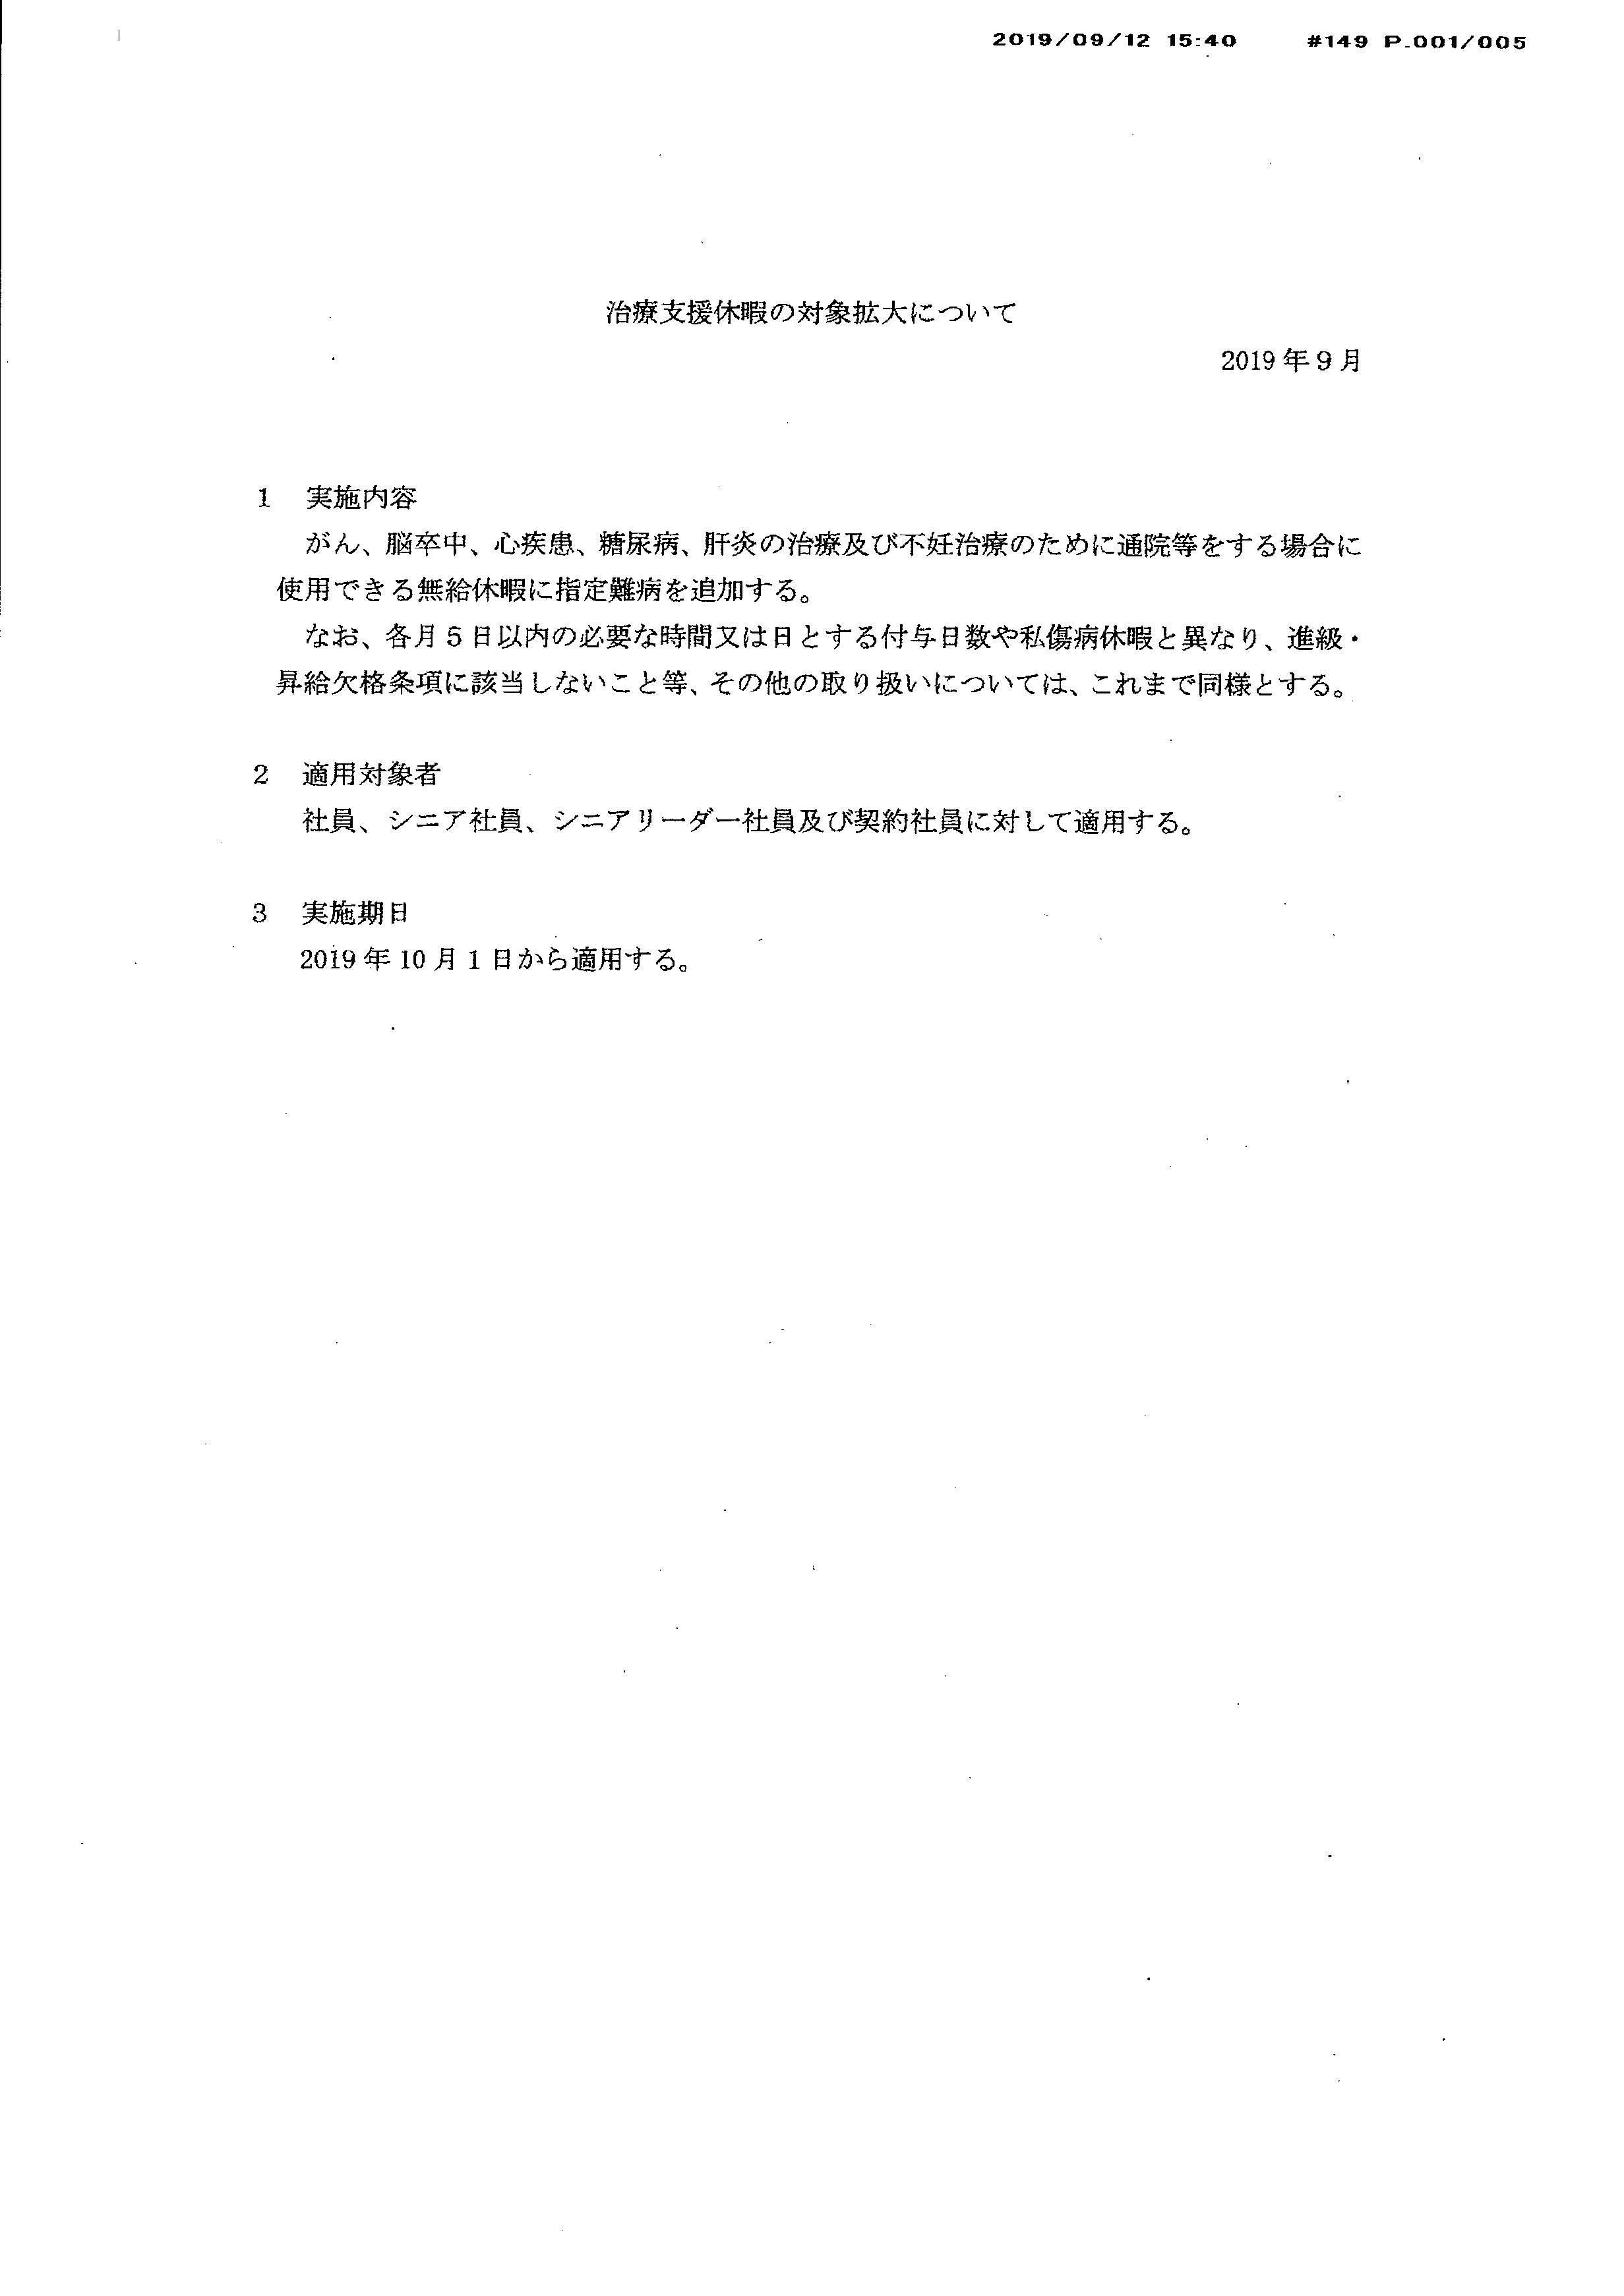 JR西日本の施策~治療支援休暇の対象拡大について、短時間勤務制度の見直しについて、再就職支援の見直しについて、テレワーク制度の本施行について、健康経営の取組みについて_d0155415_11374970.jpg